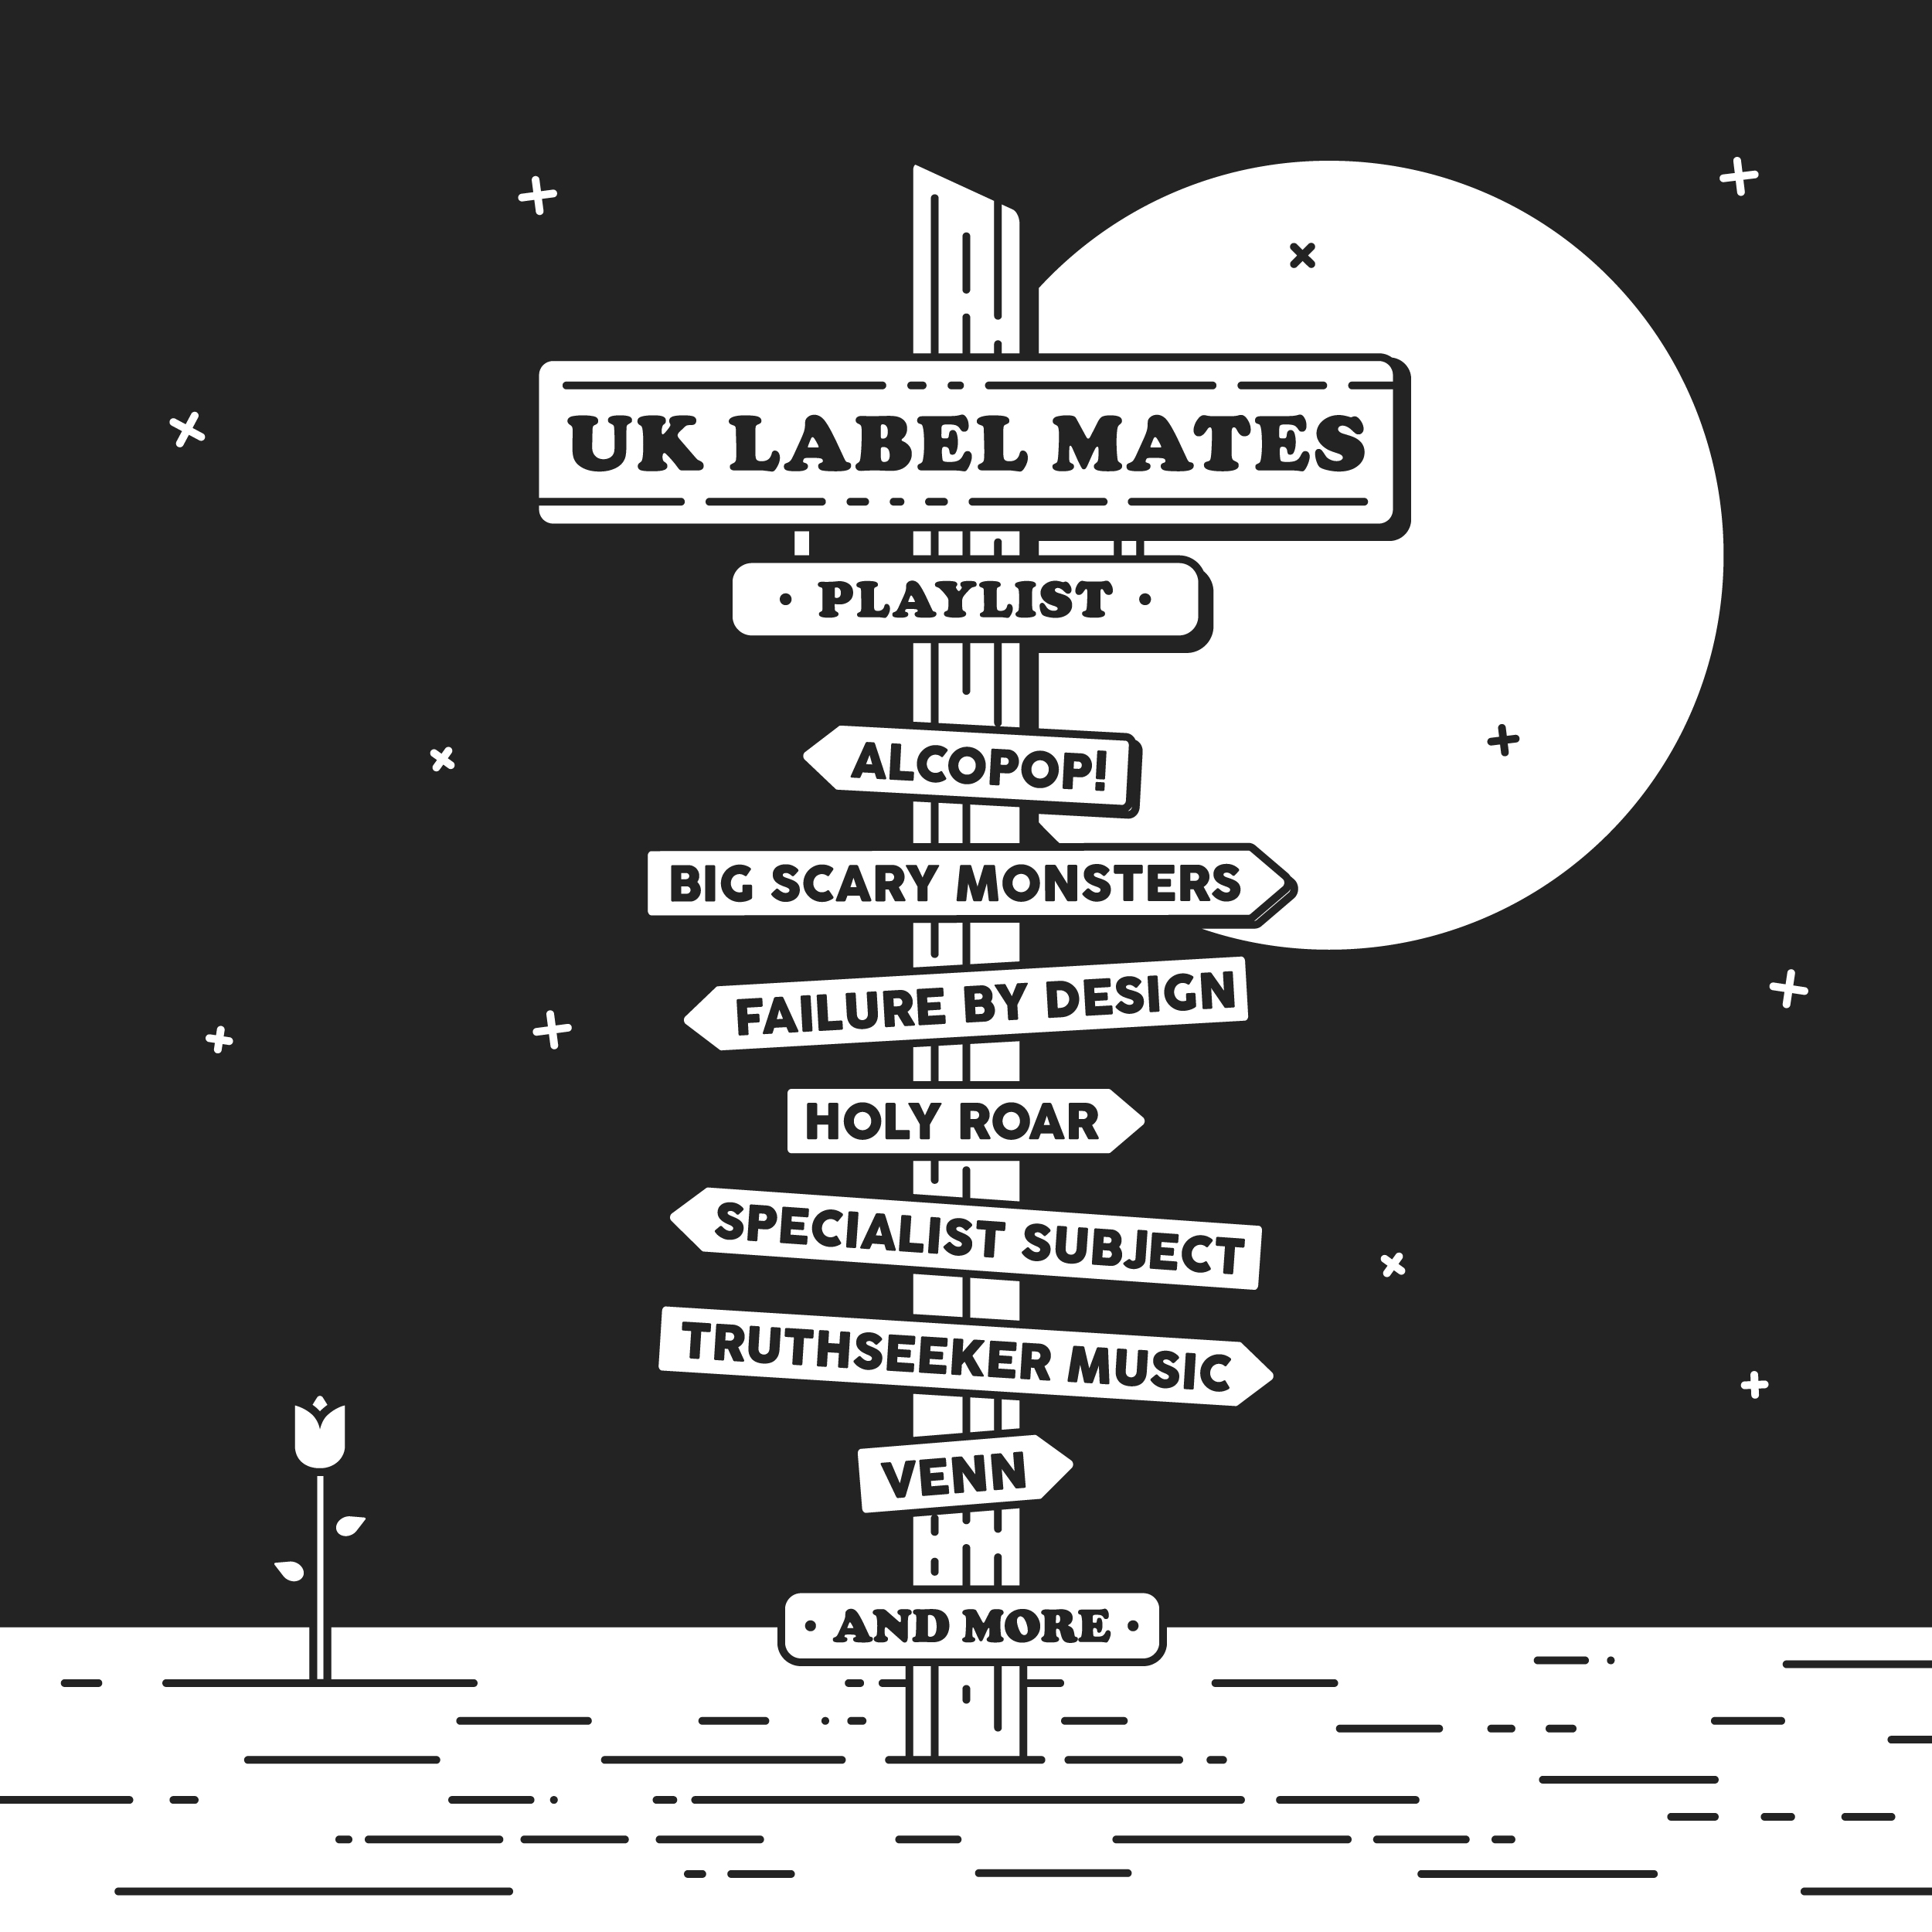 UK-Label-Mates-V2.jpg